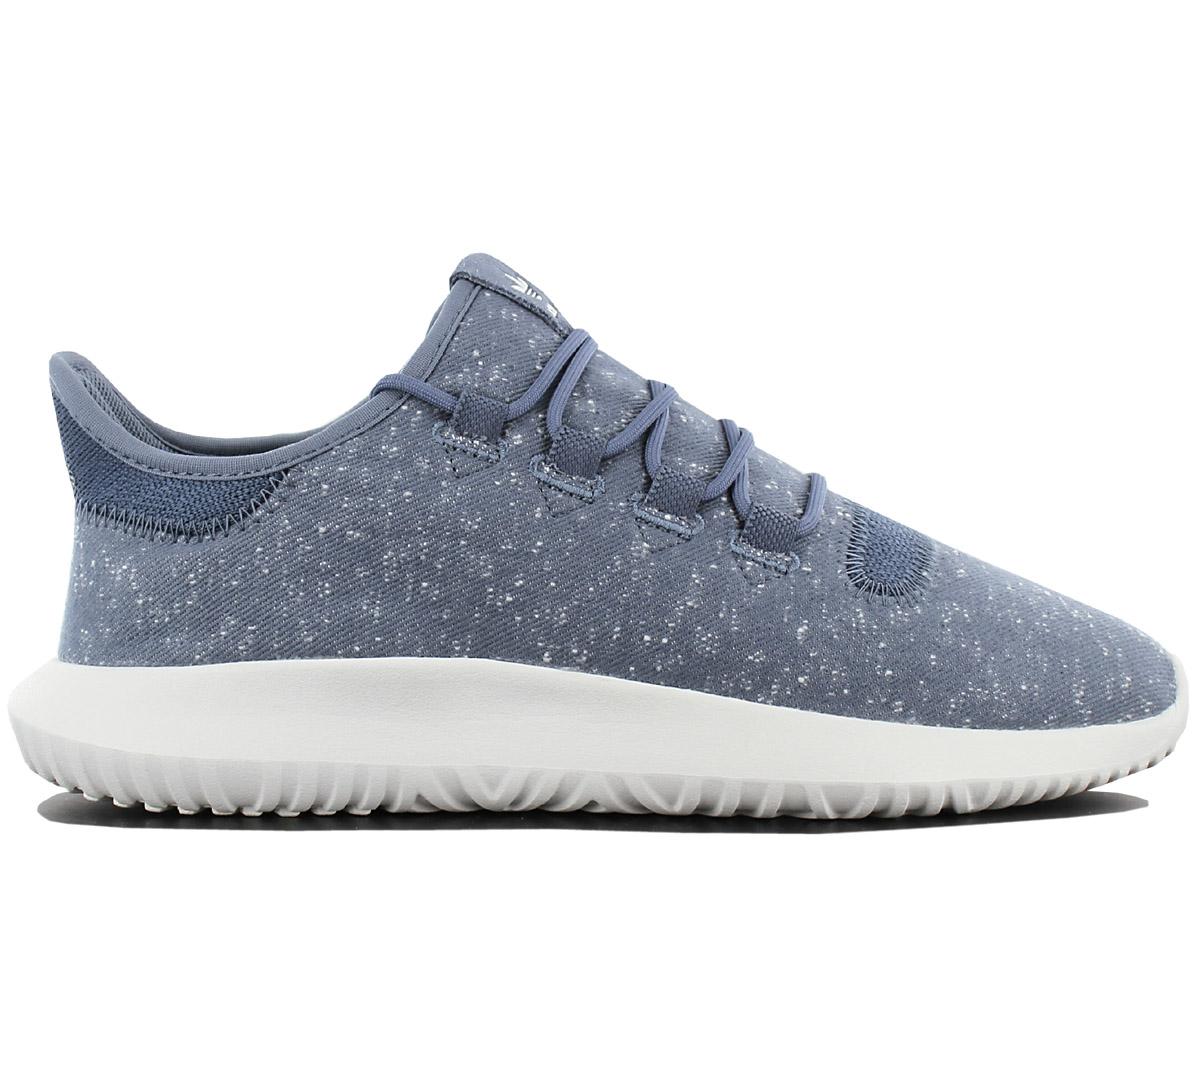 37bfa0fcc3746 Adidas Originals Tubular Shadow Trainers Shoes Blue Sneakers Leisure ...